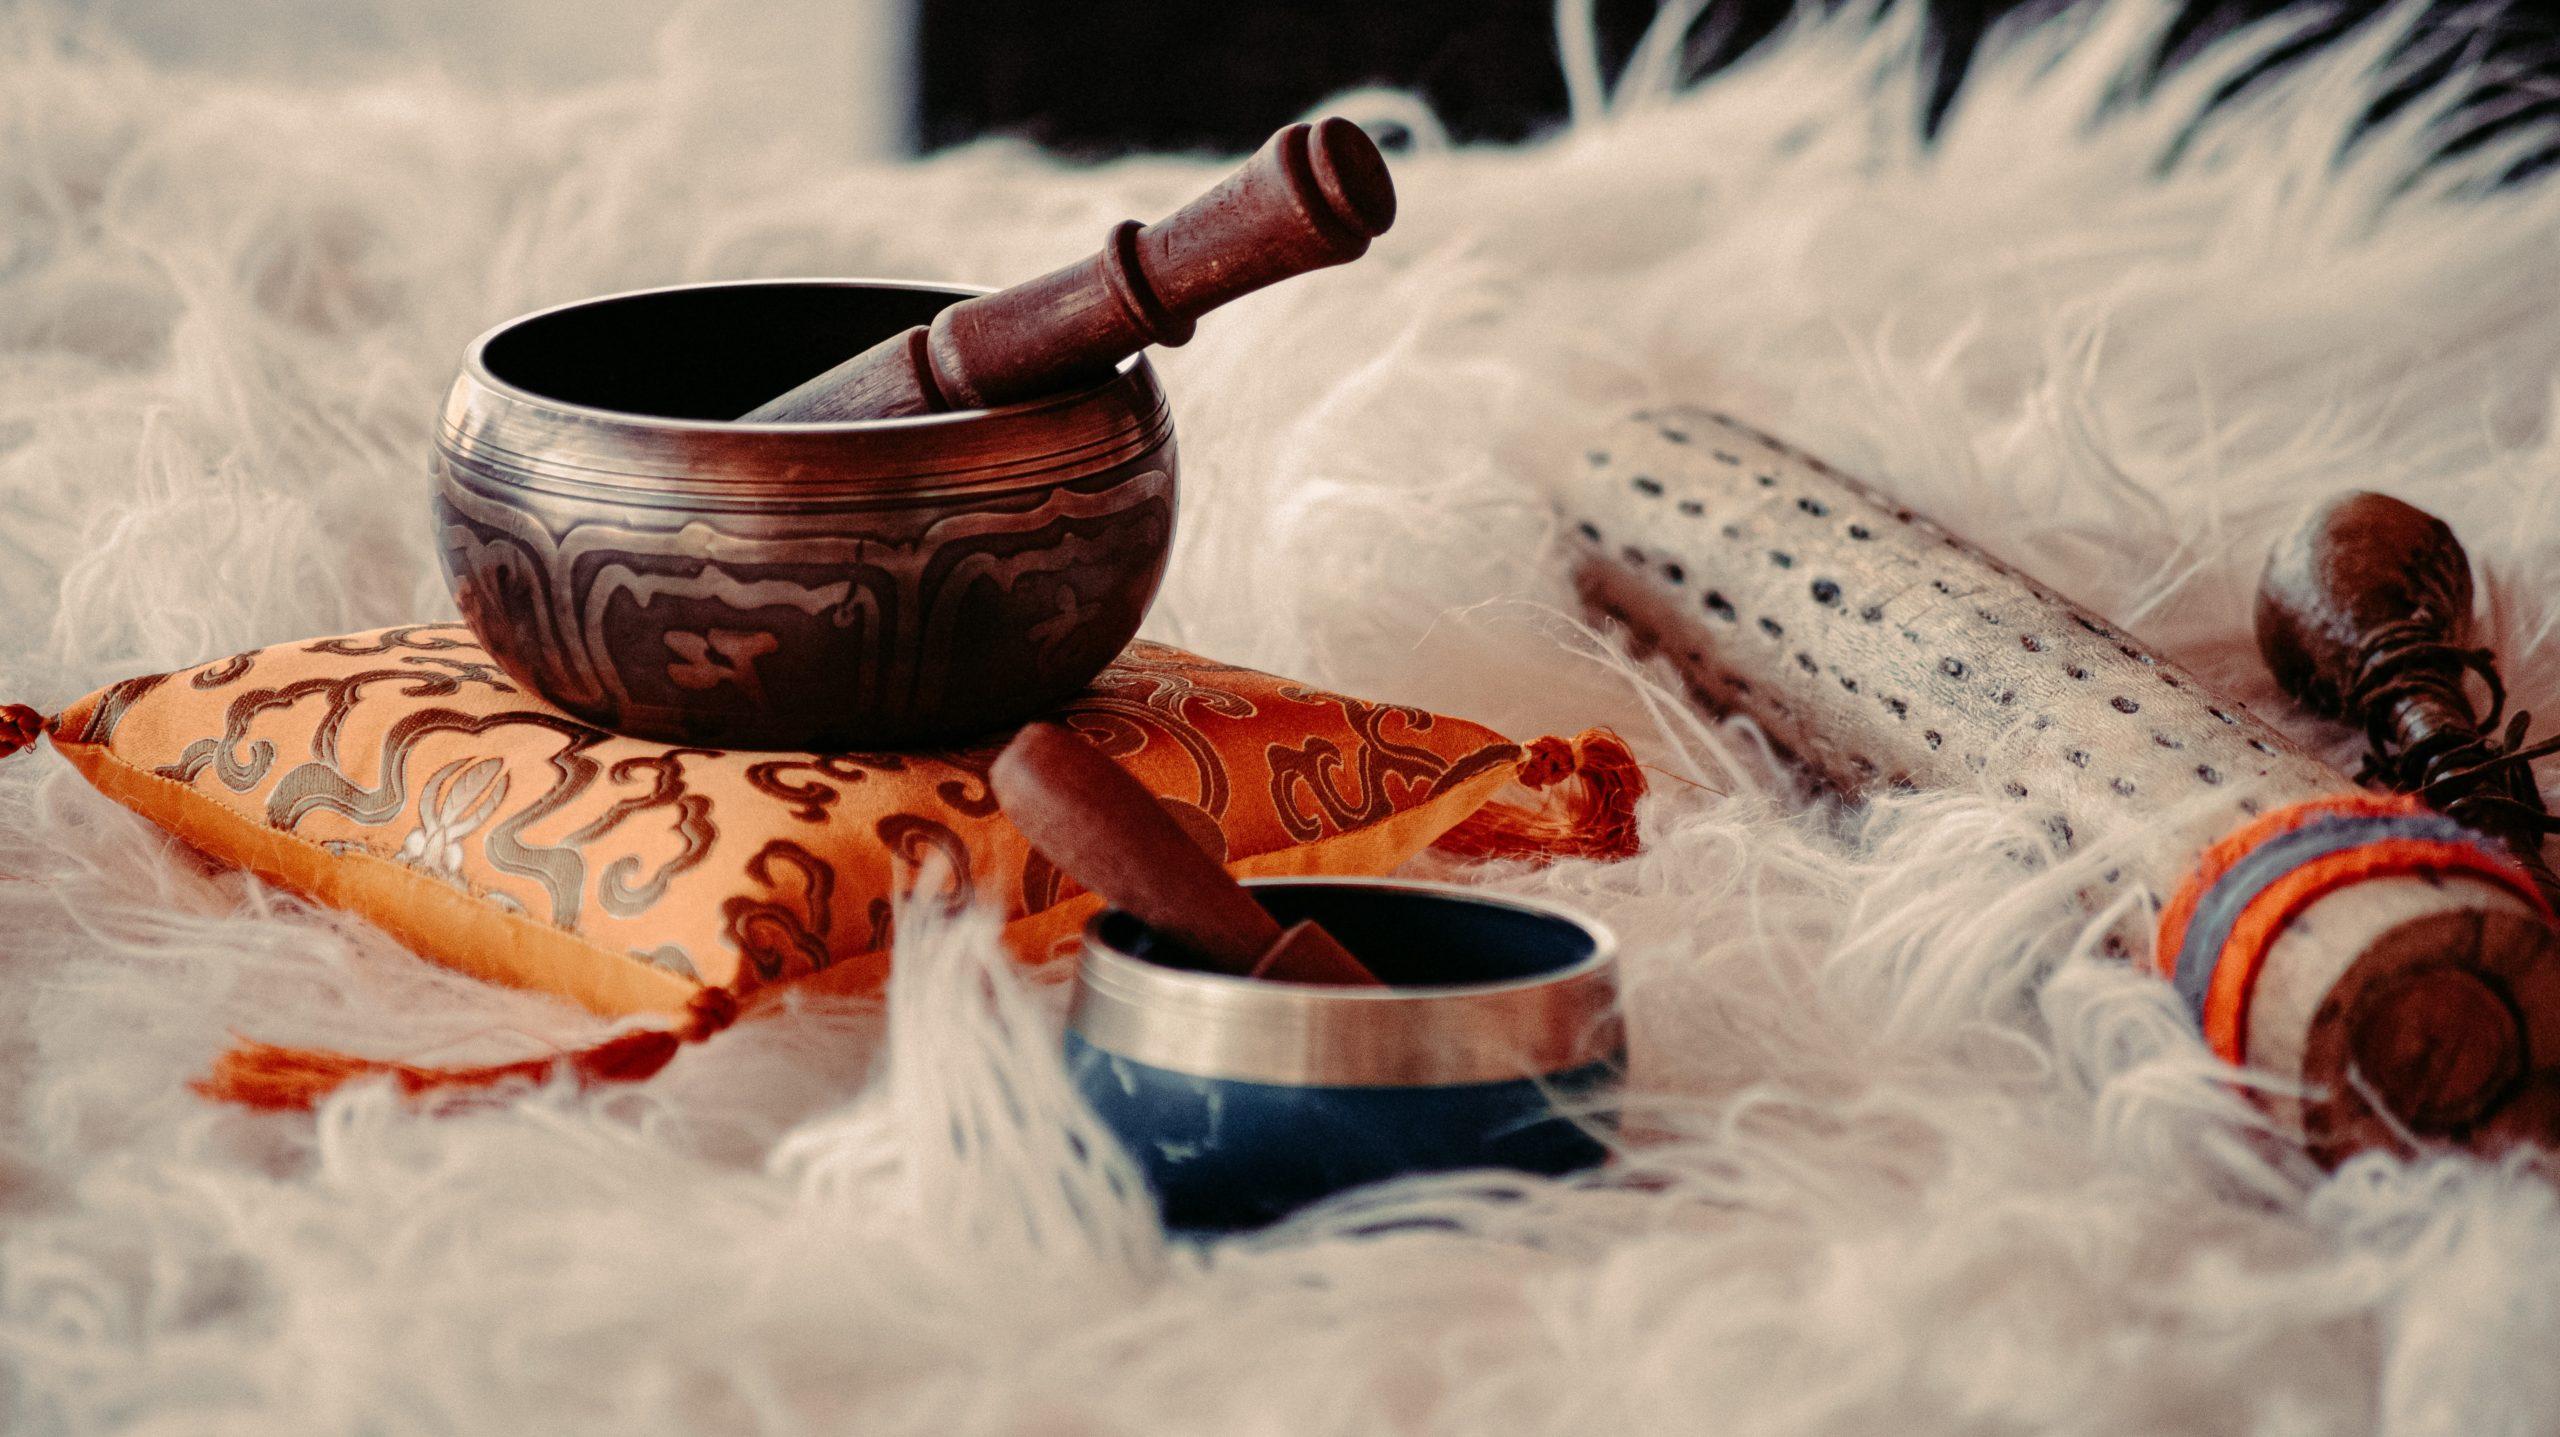 Tibetan singing bowls resting on a sheepskin rug